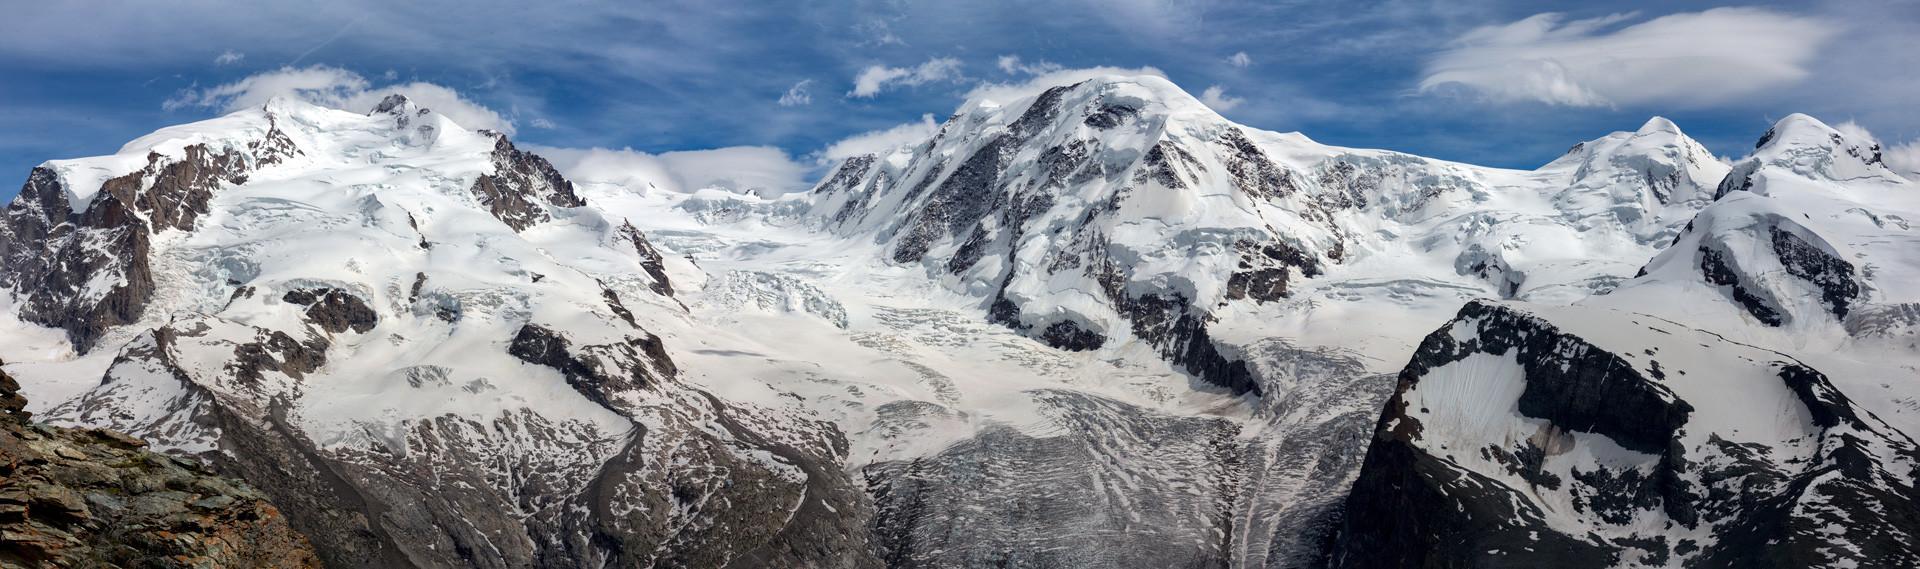 Zermatt_20150629_Gornergrat_Pano3